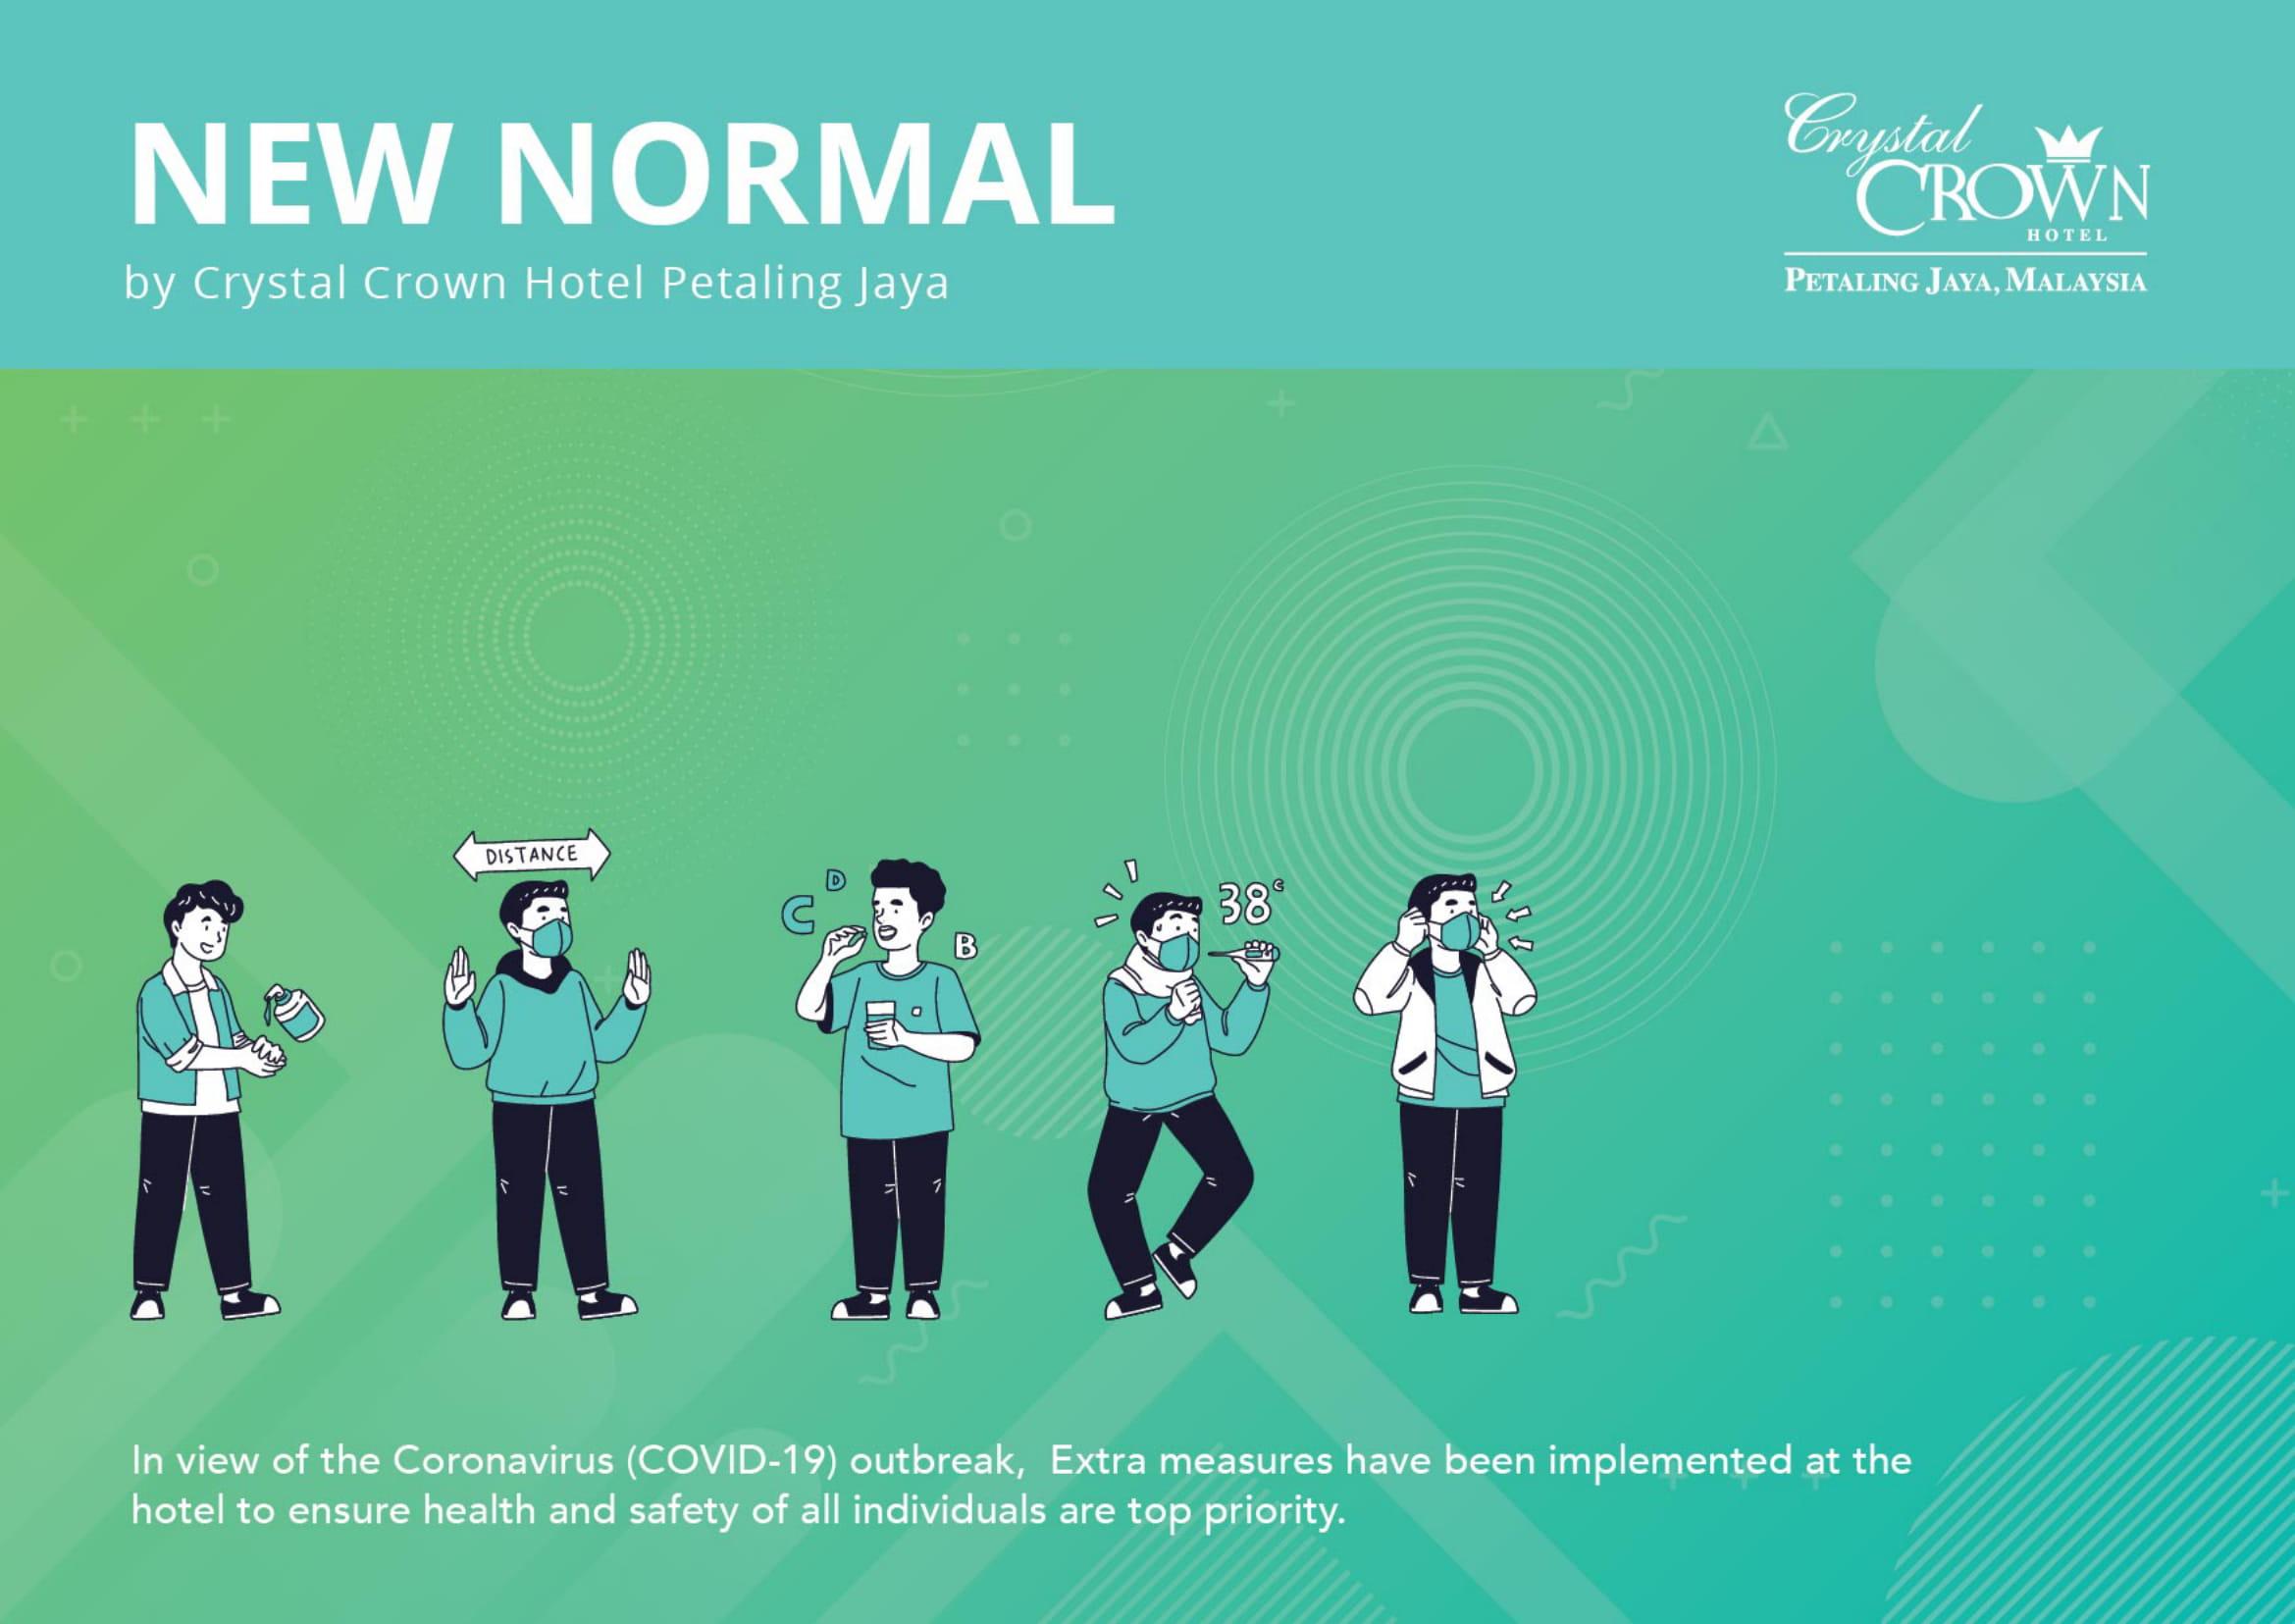 NewNomal_CCHPJ-01